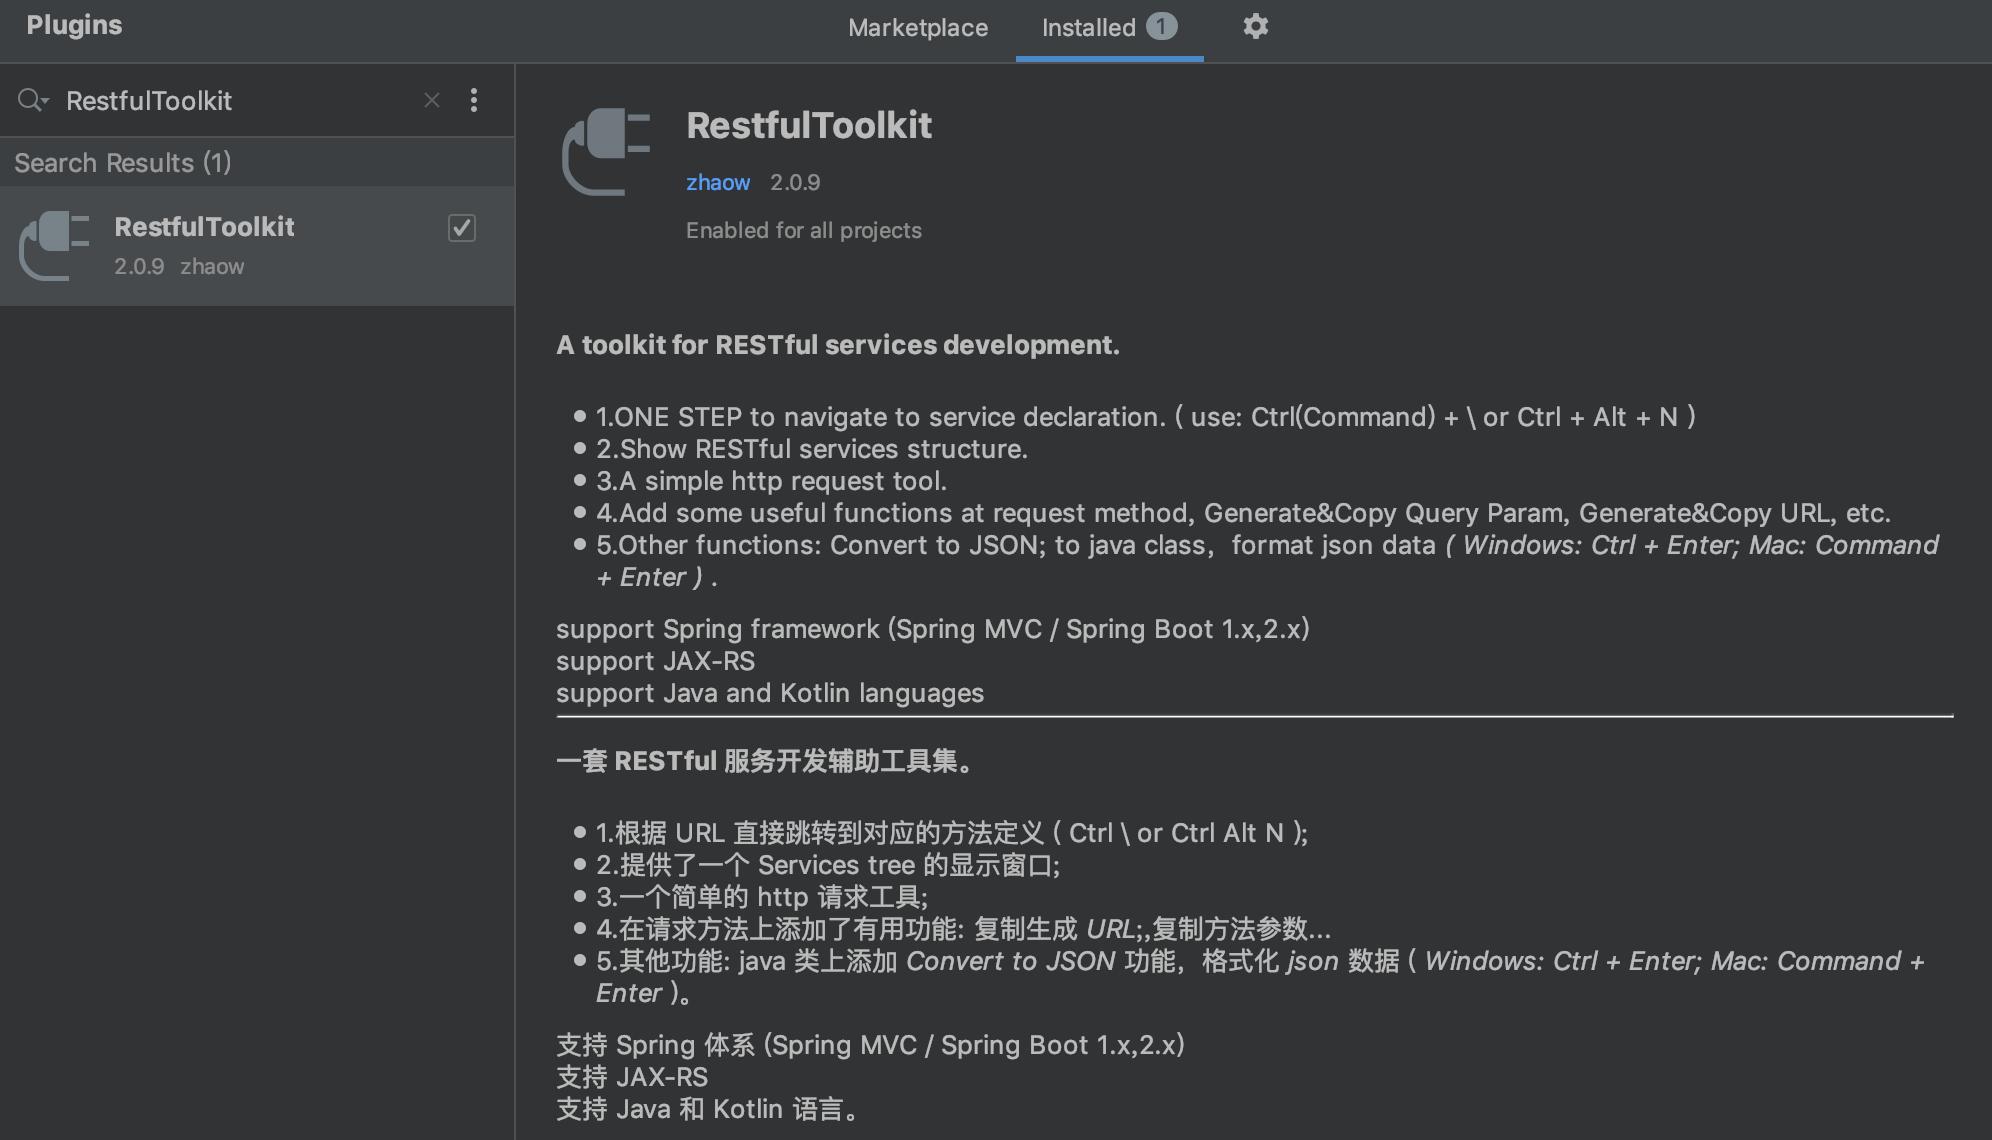 RestfulToolkit